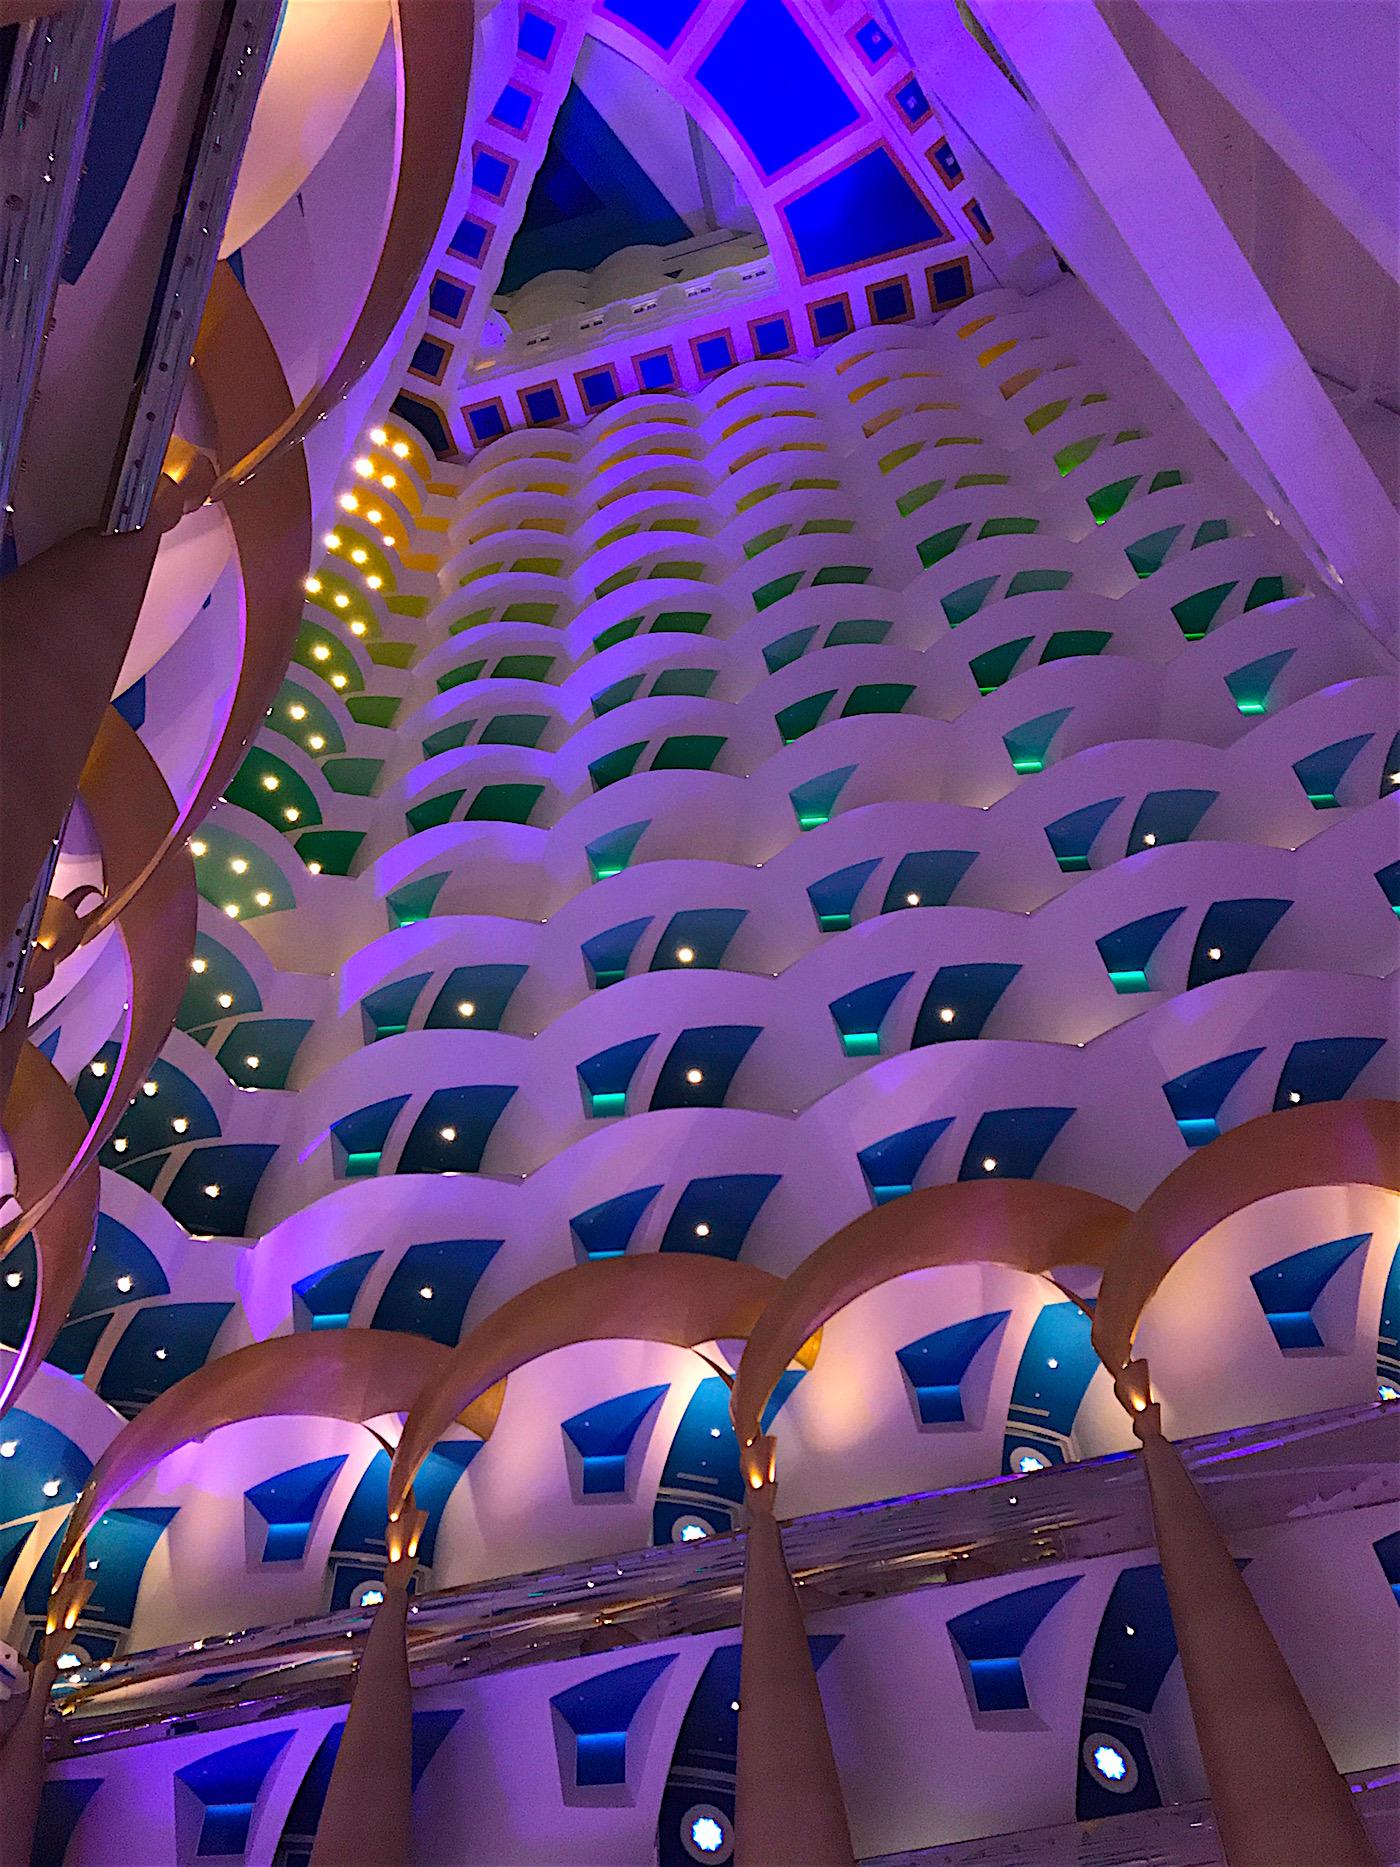 Click here to see a rare glimpse into the lobby of the Burj Al Arab Hotel